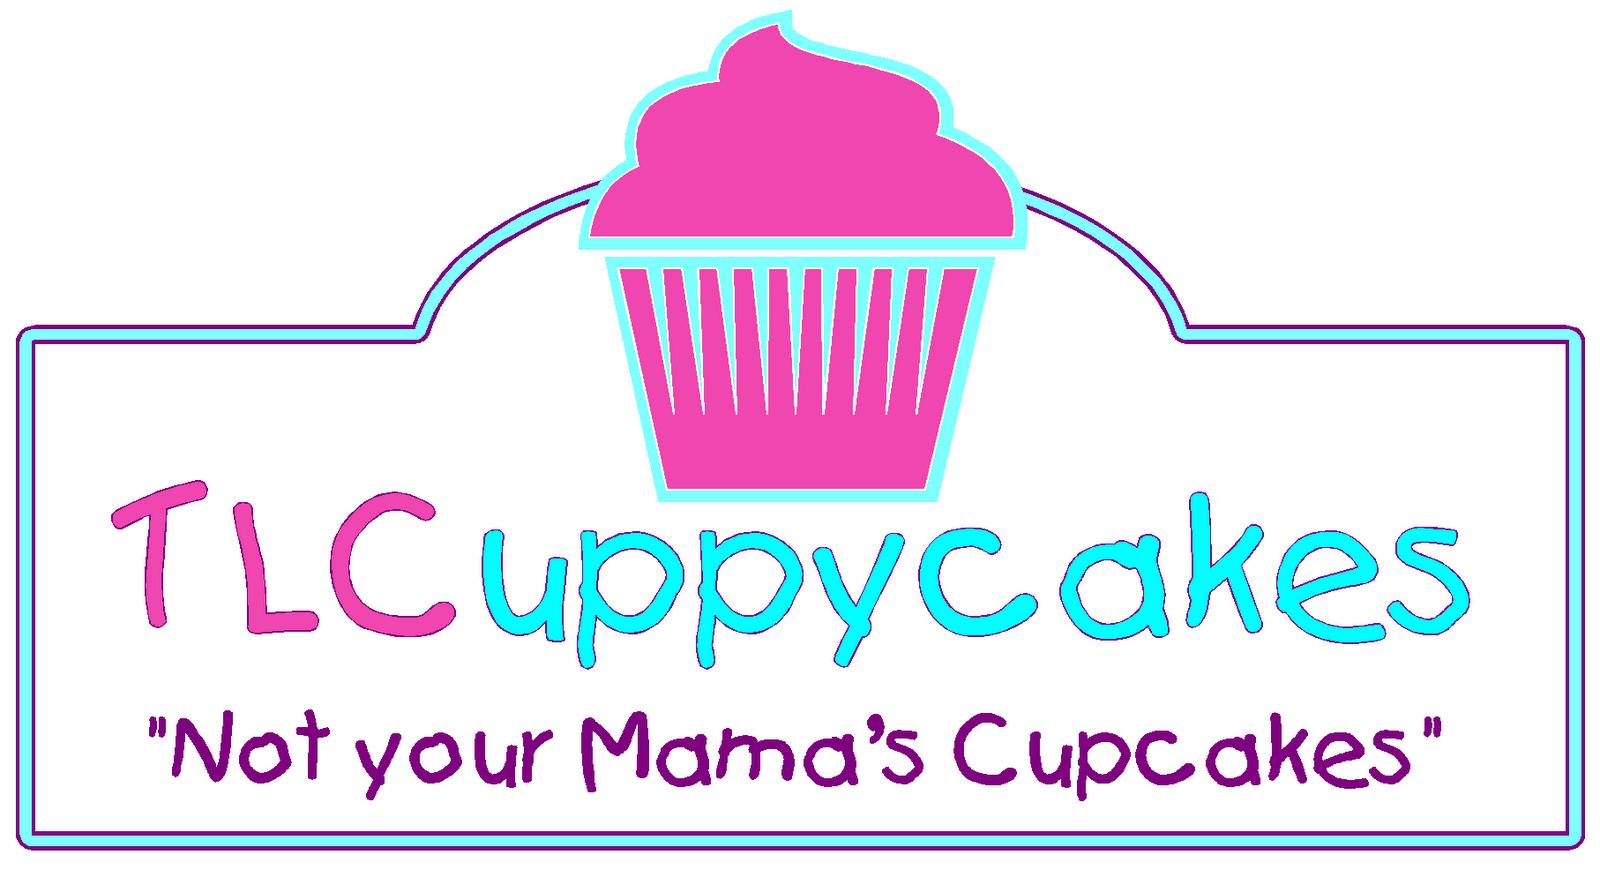 TLCuppycakes